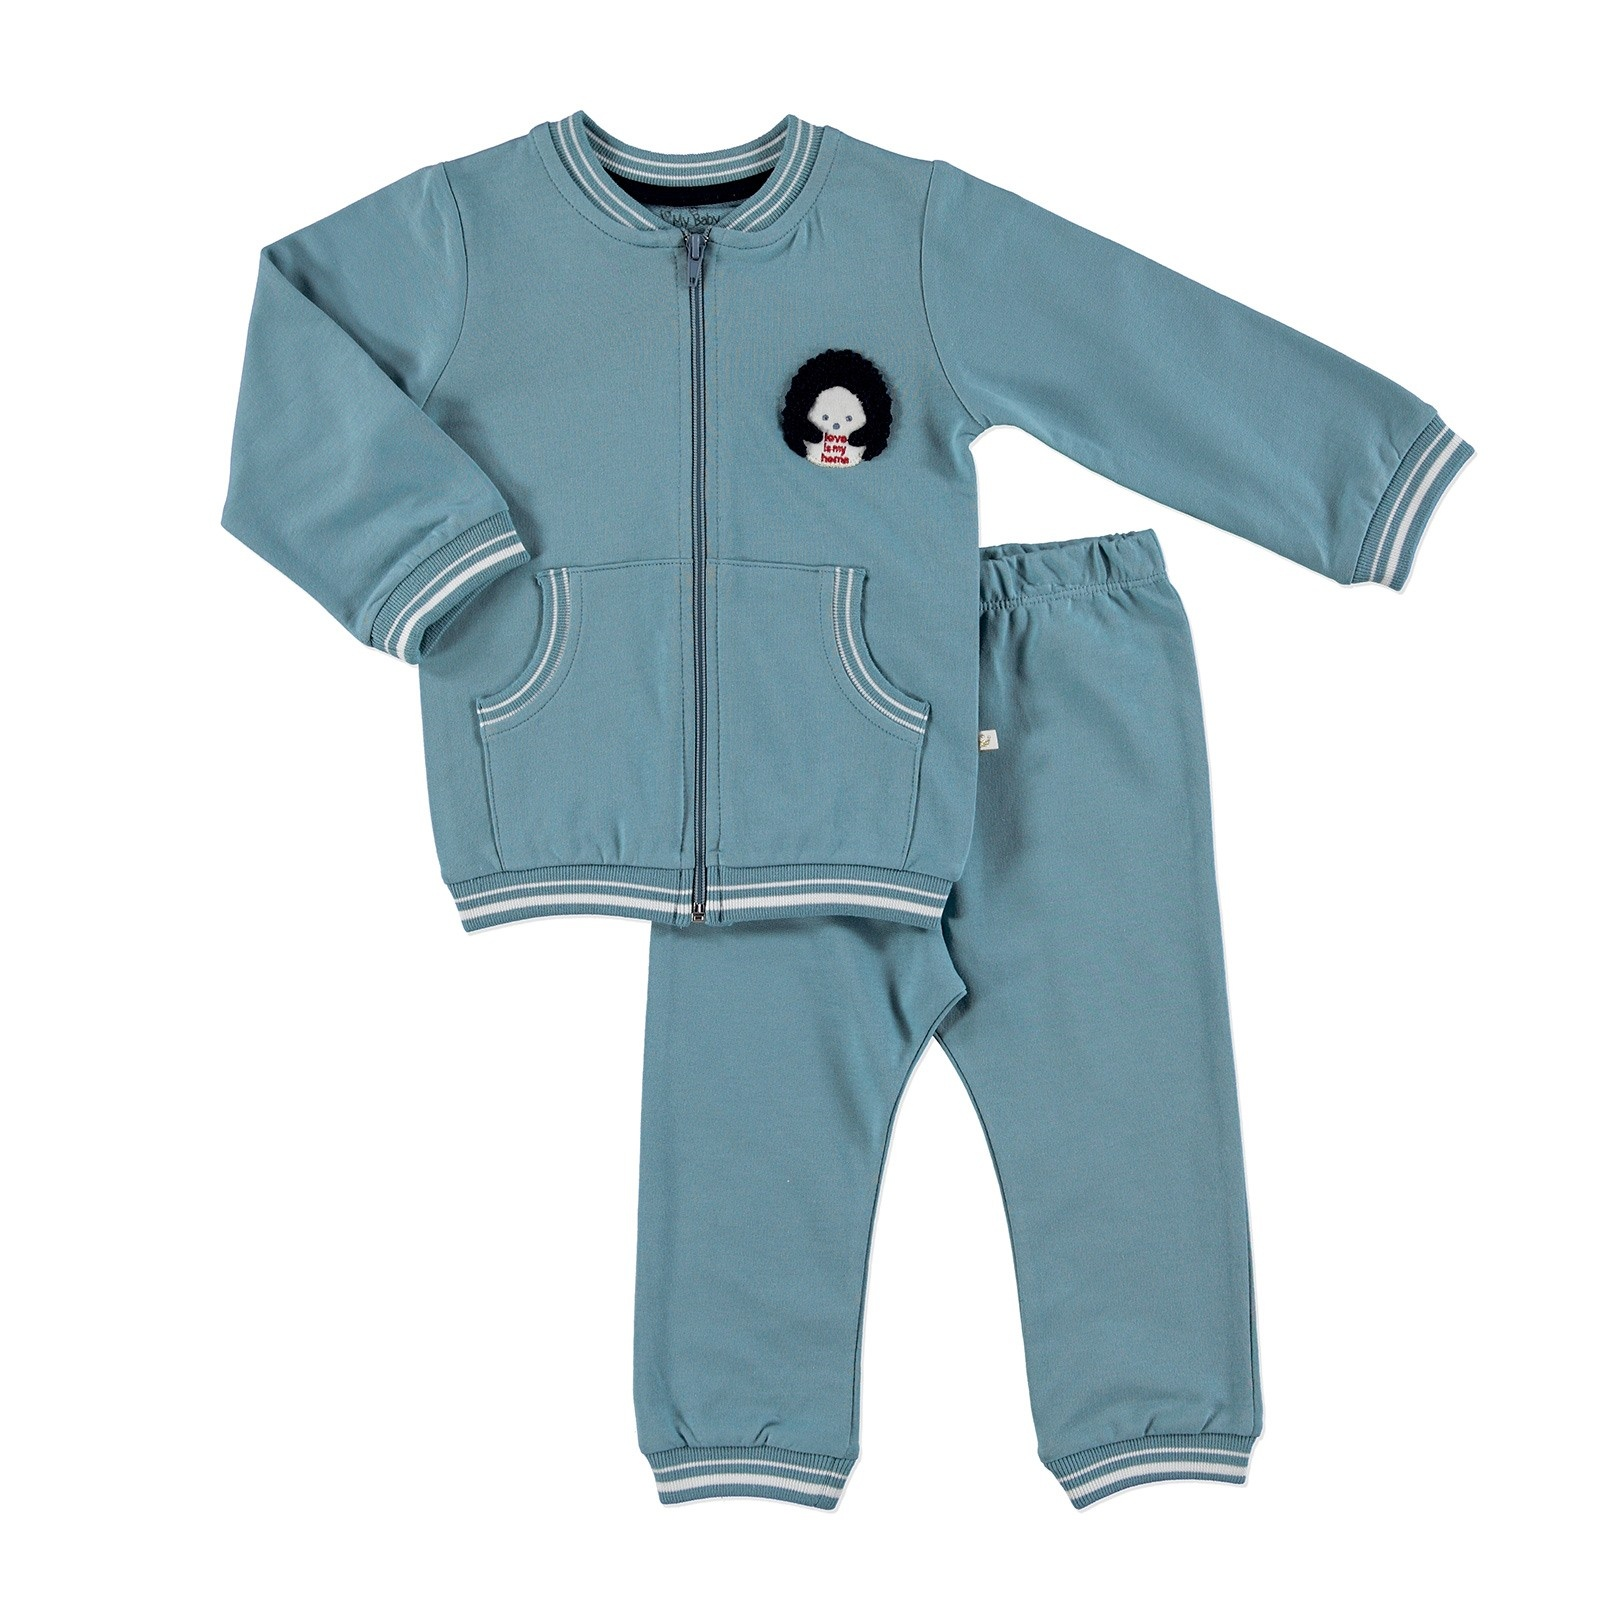 Ebebek For My Baby Joy Sweatshirt Trousers 2 Pcs